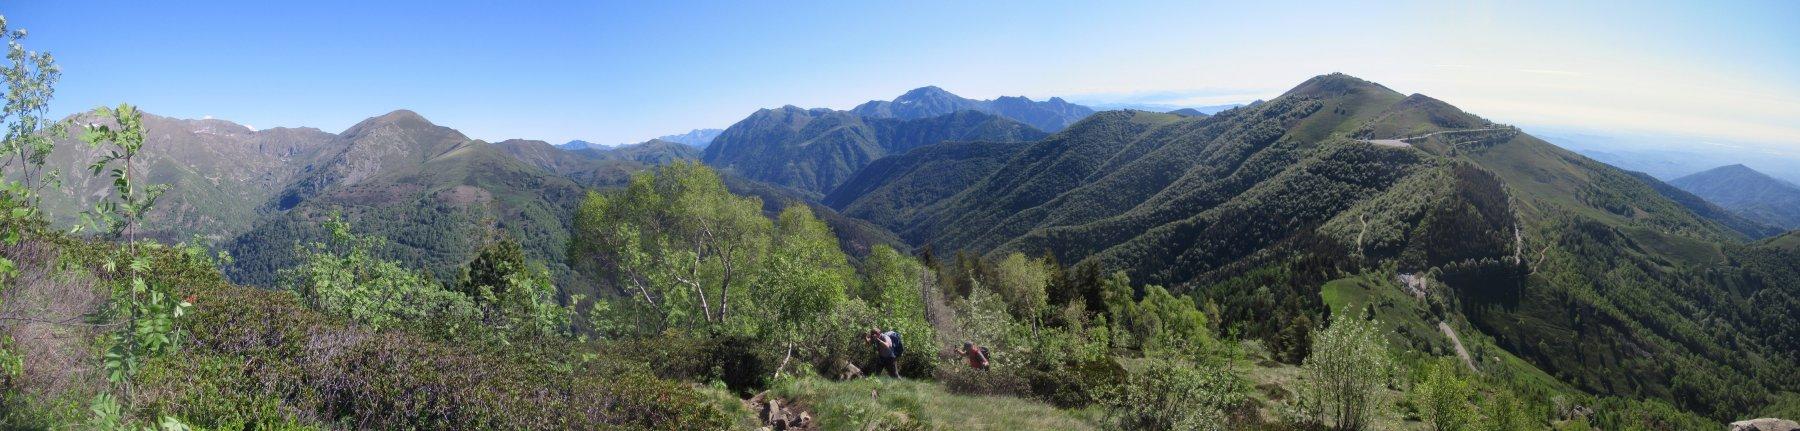 salendo al Monticchio